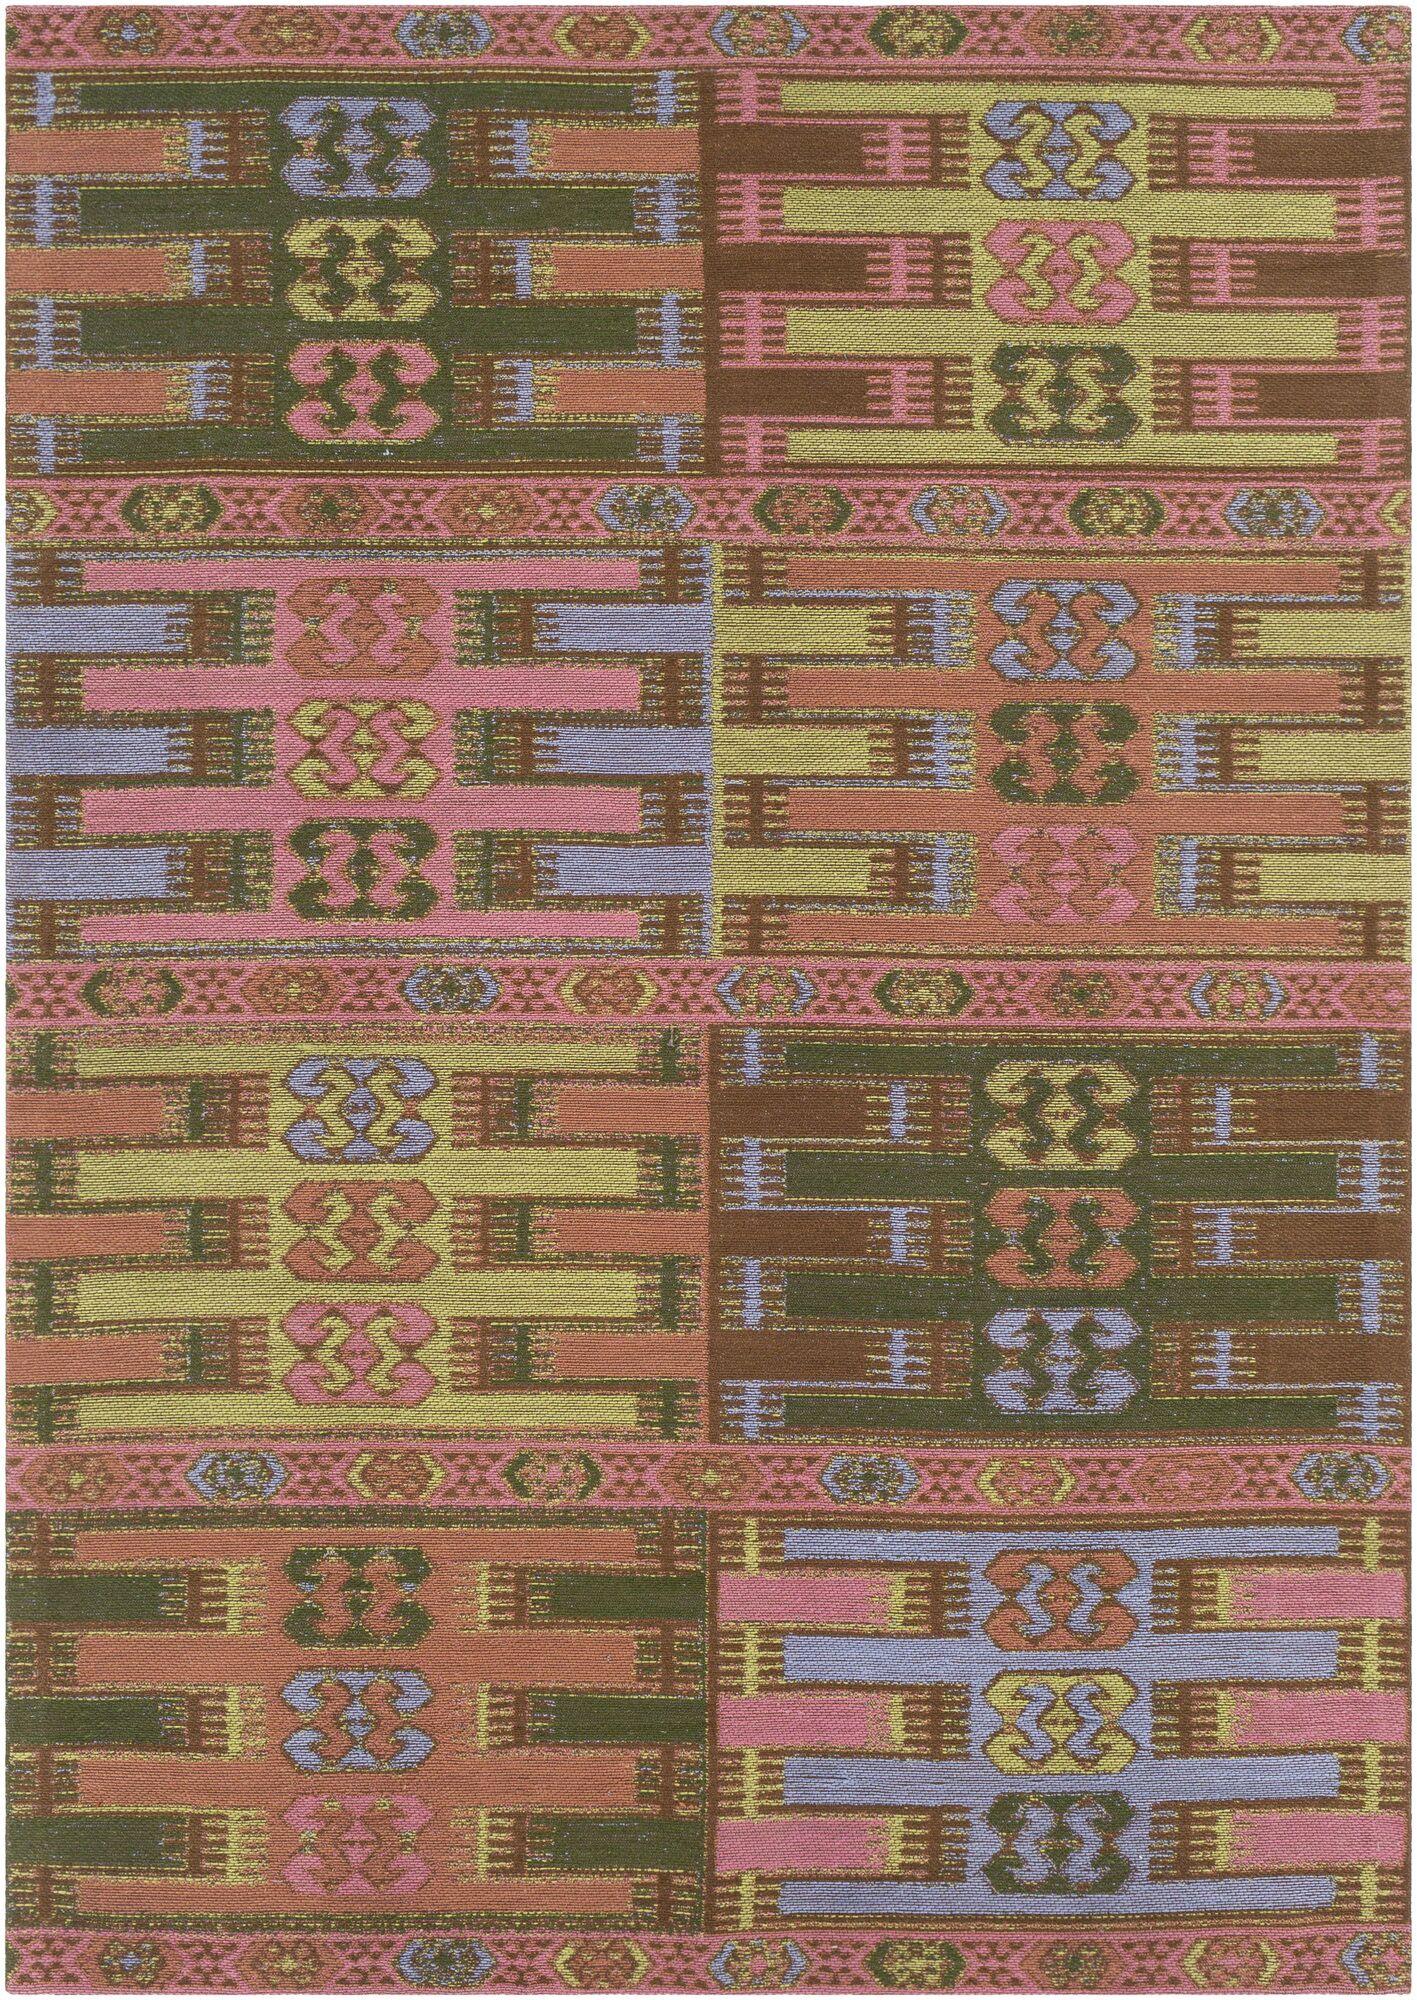 Ridge Manor Hand Woven Blush/Emerald Outdoor Area Rug Rug Size: Rectangle 4' x 6'